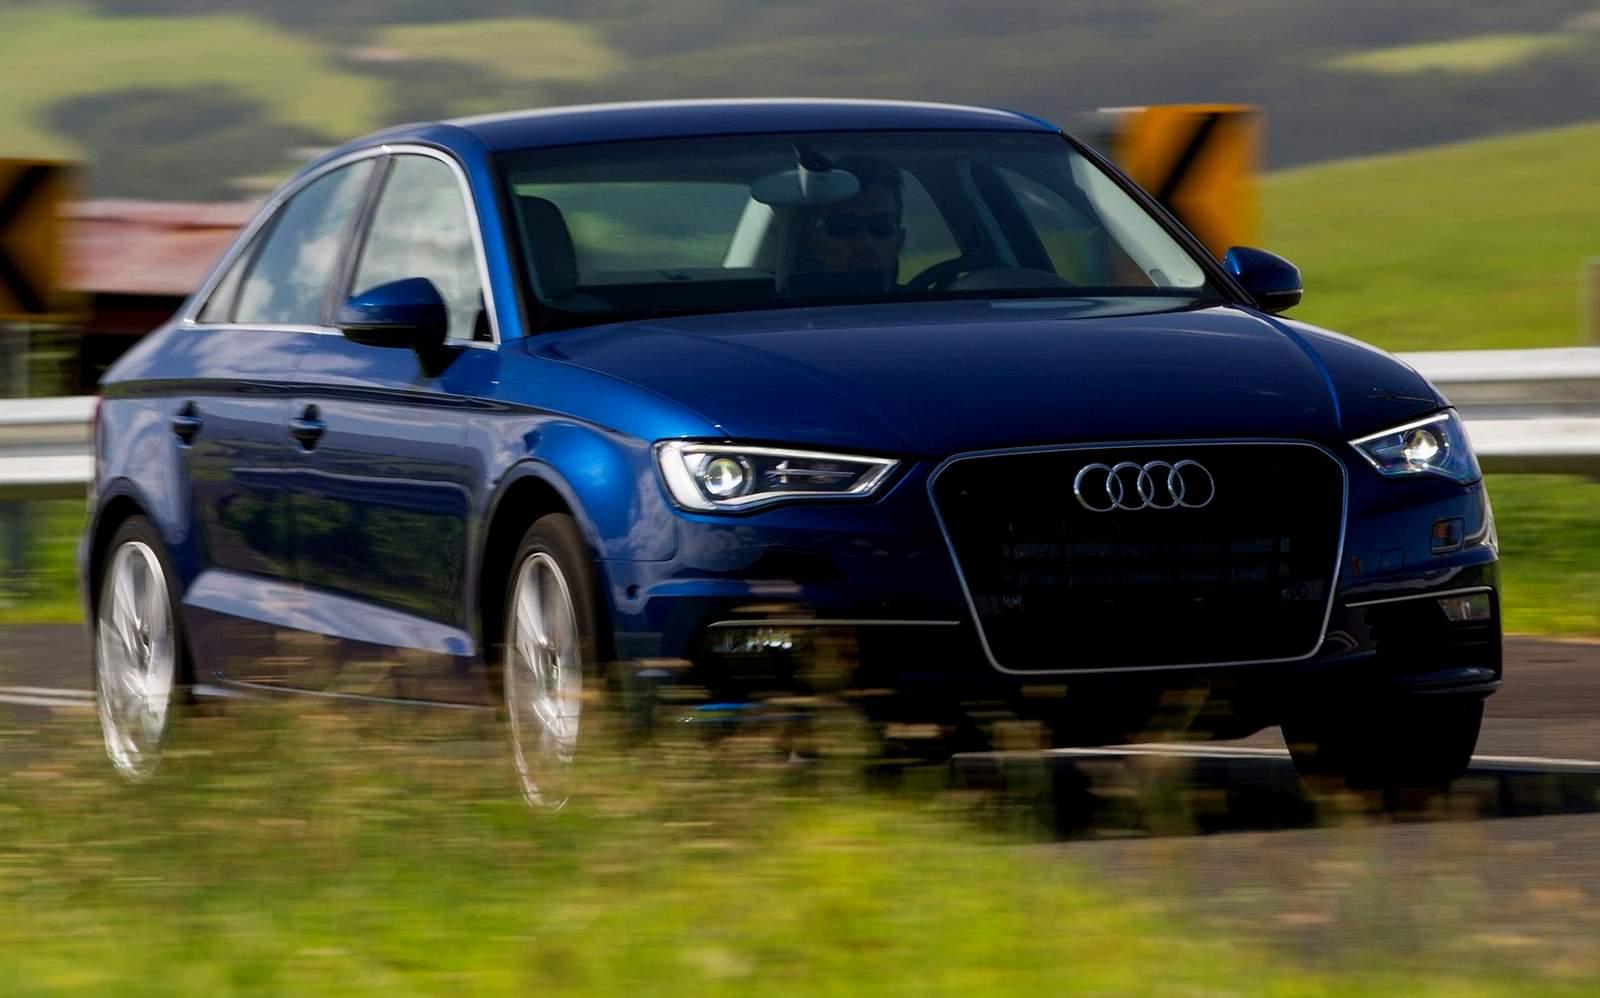 Novo Audi A3 2.0 Ambition 2016 - preço